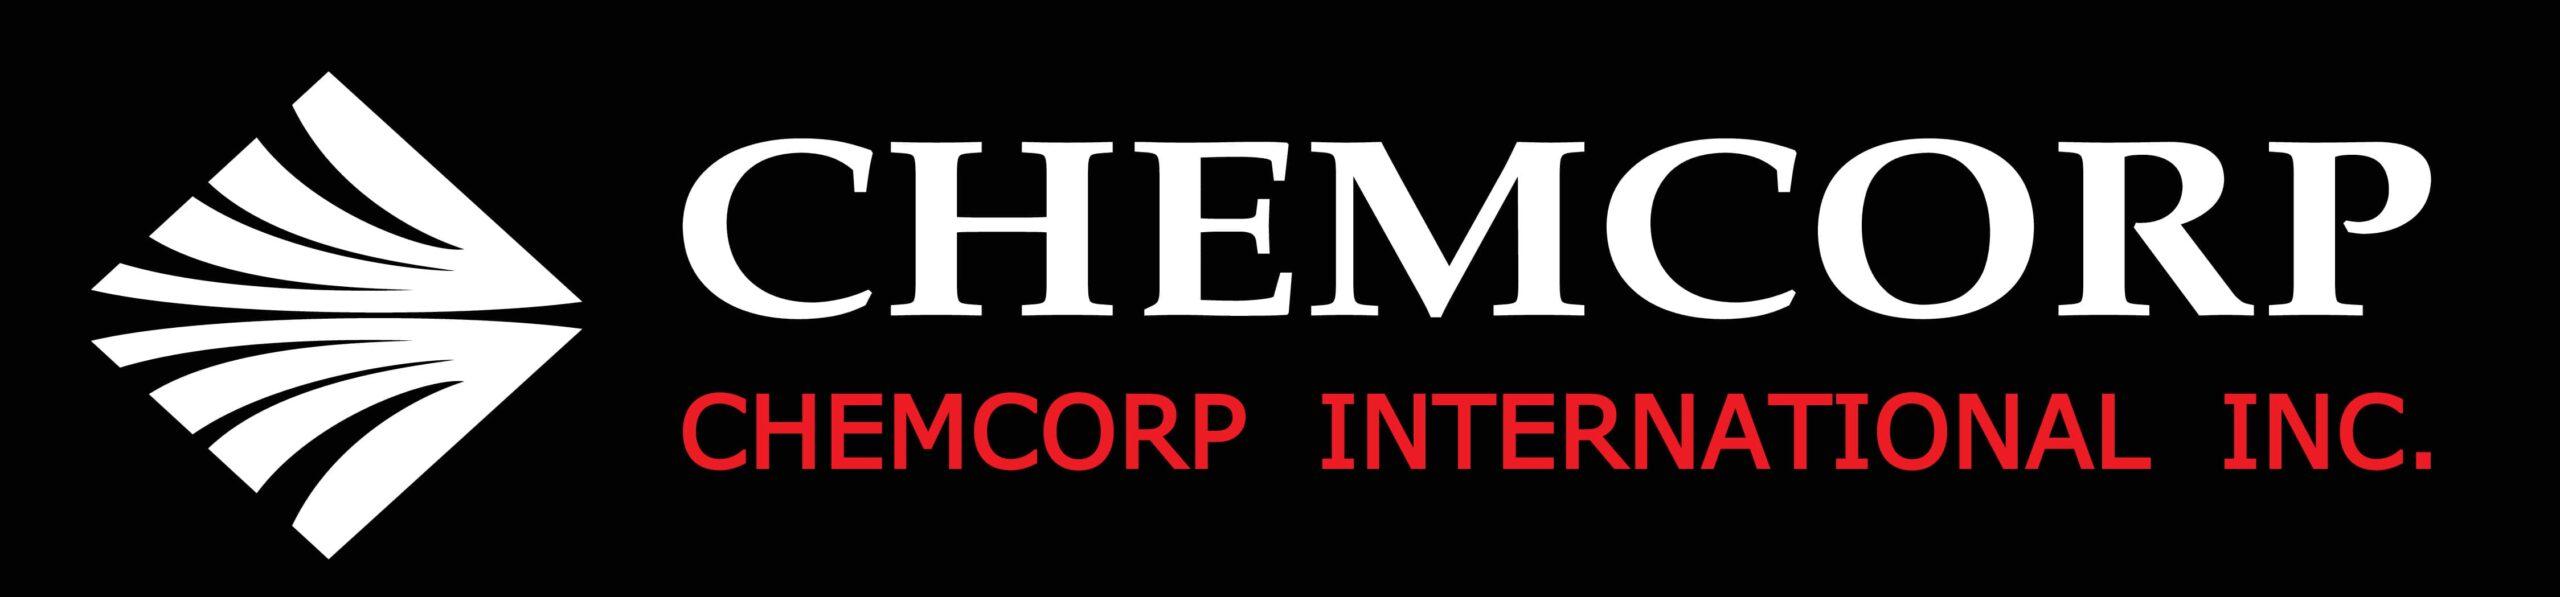 logo-chemcorp-blanco